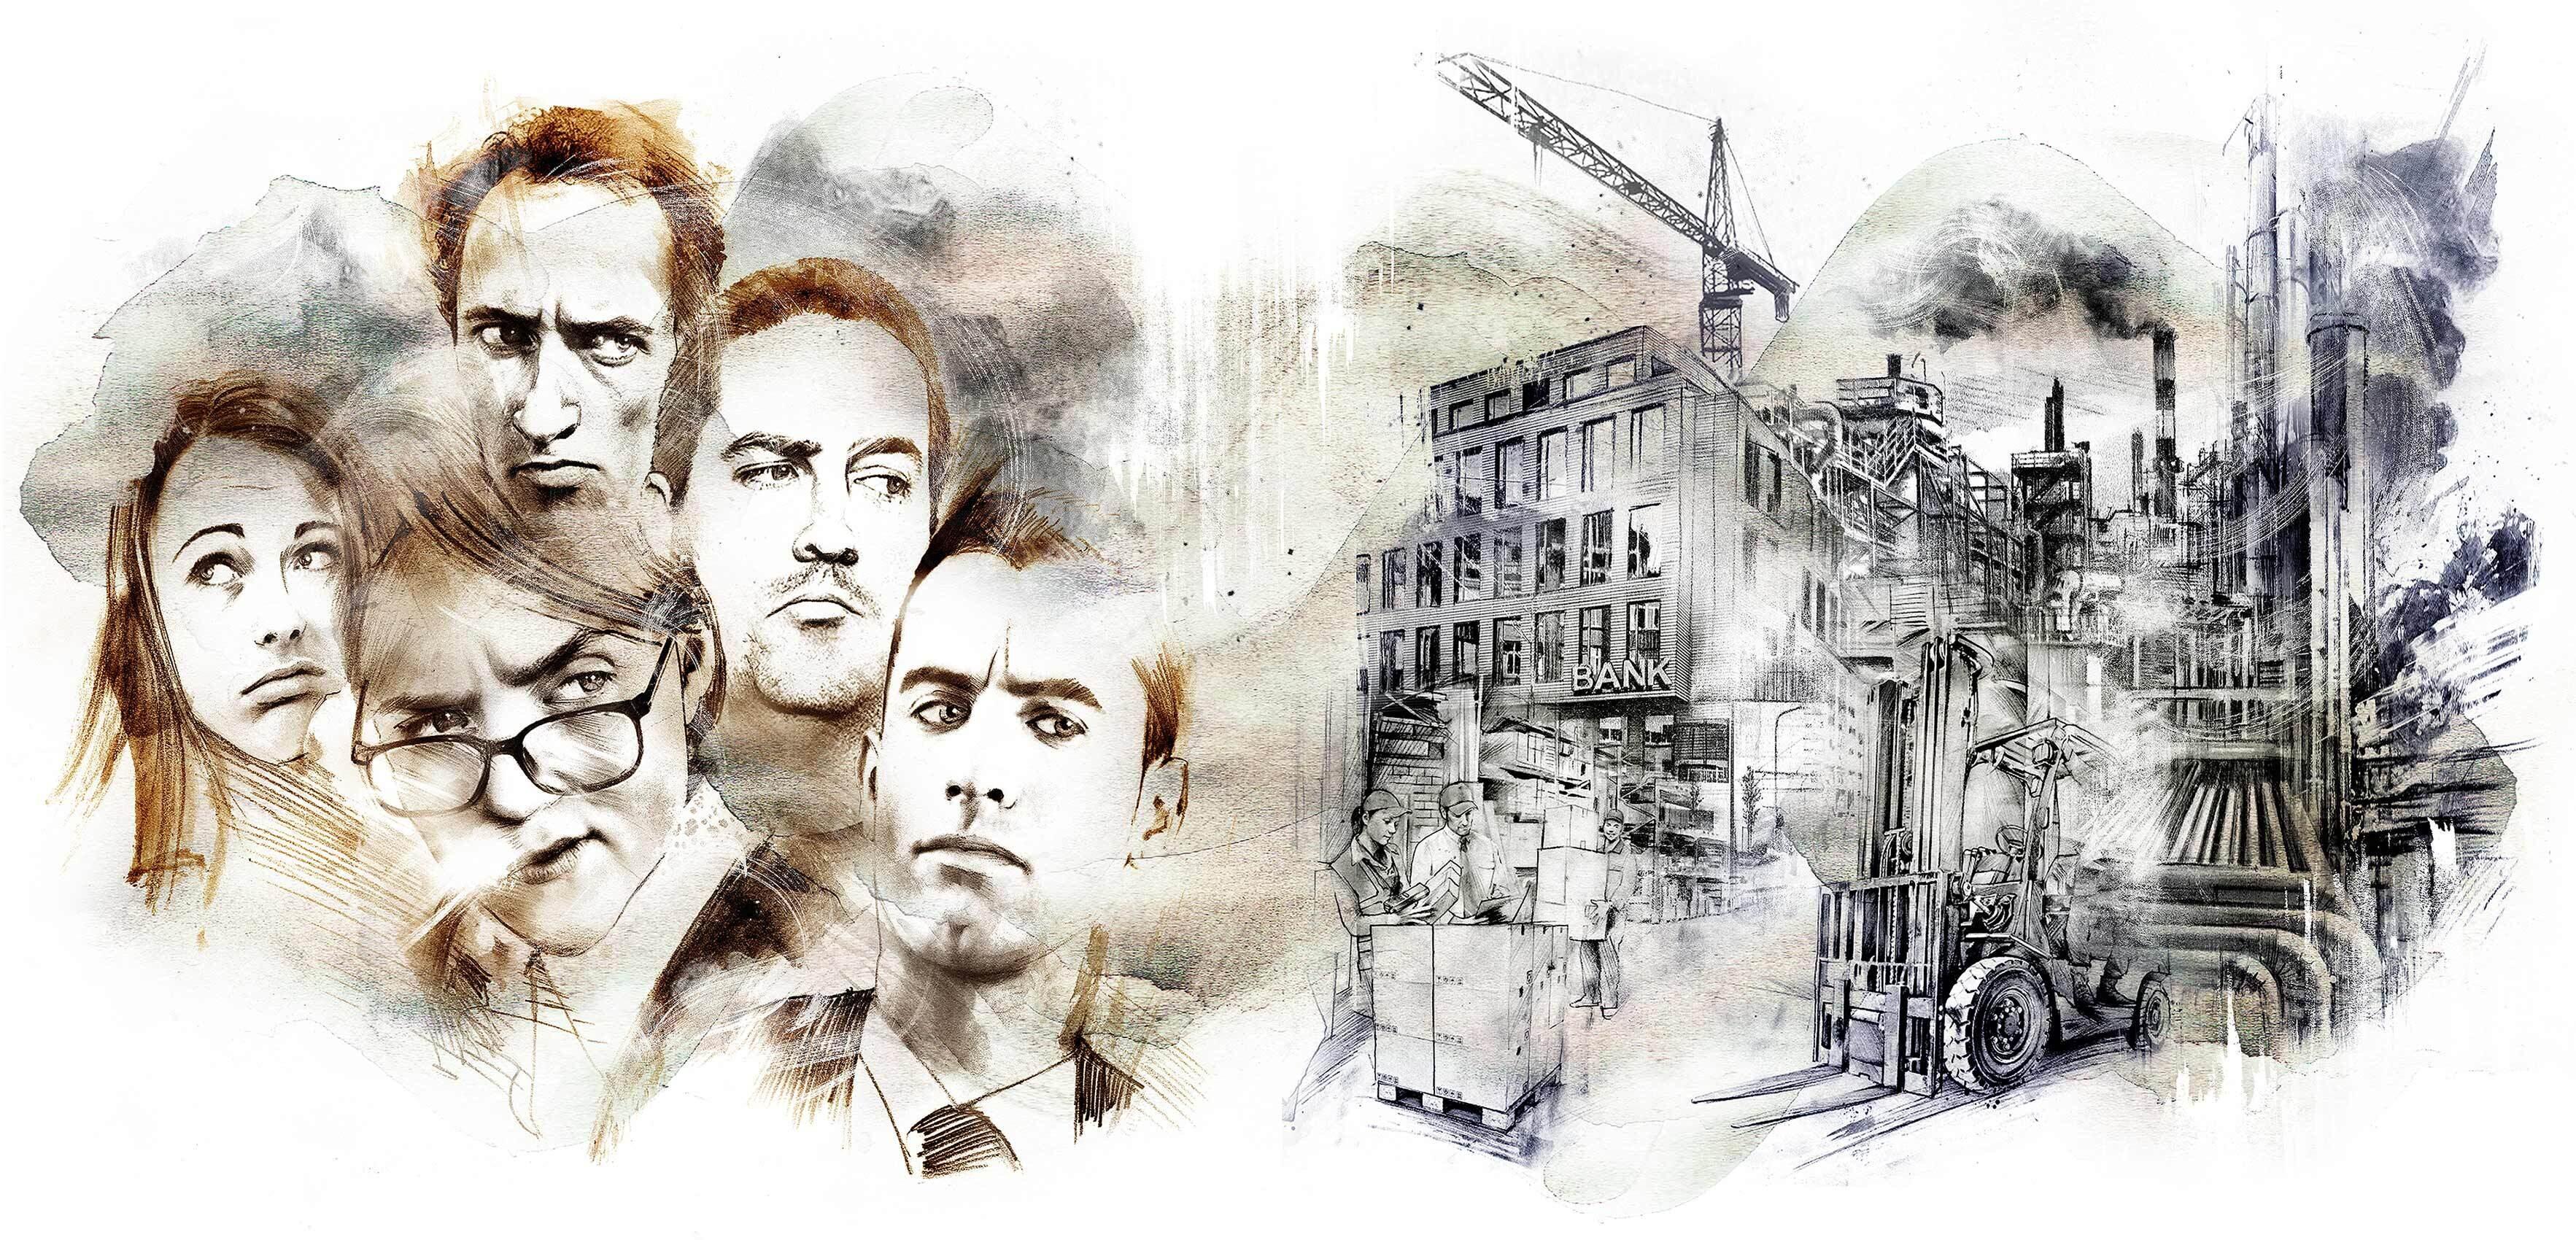 Economy mistrust - Kornel Illustration | Kornel Stadler portfolio